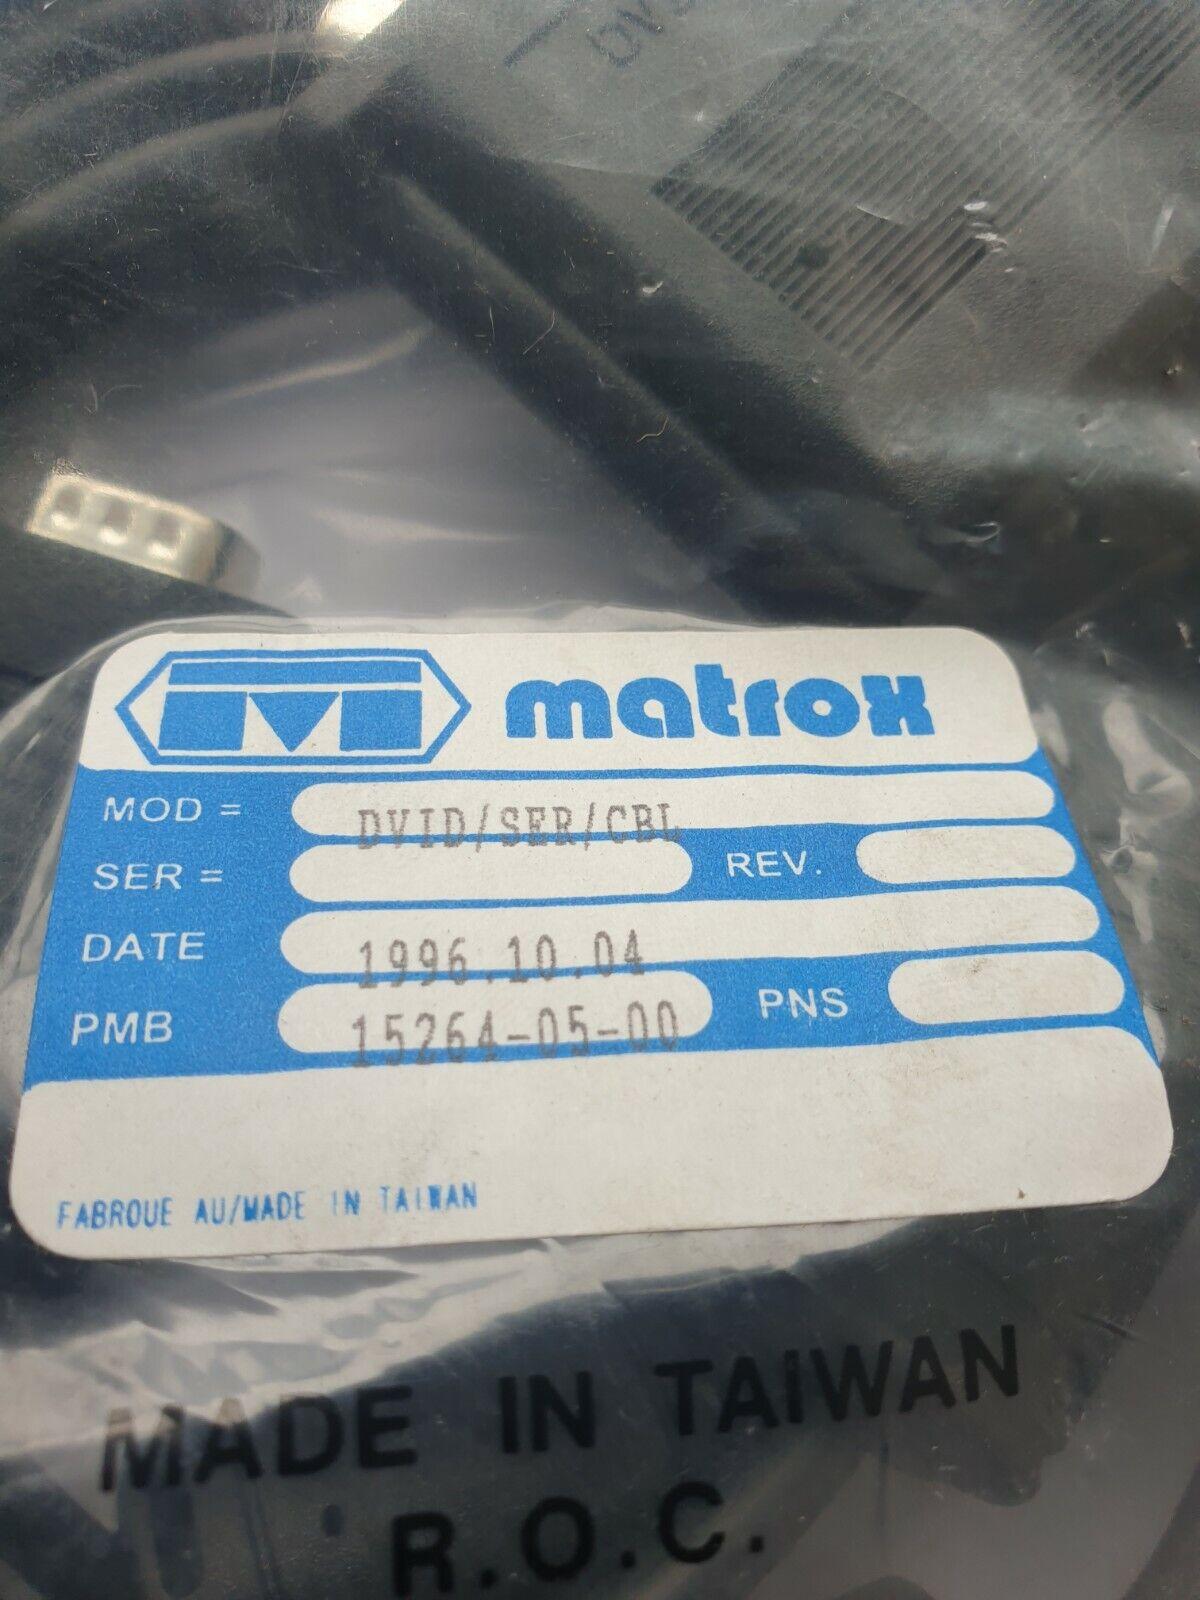 MATROX DVID/SER/CBL 15264-05-00 CABLE (R3S5.4B4)